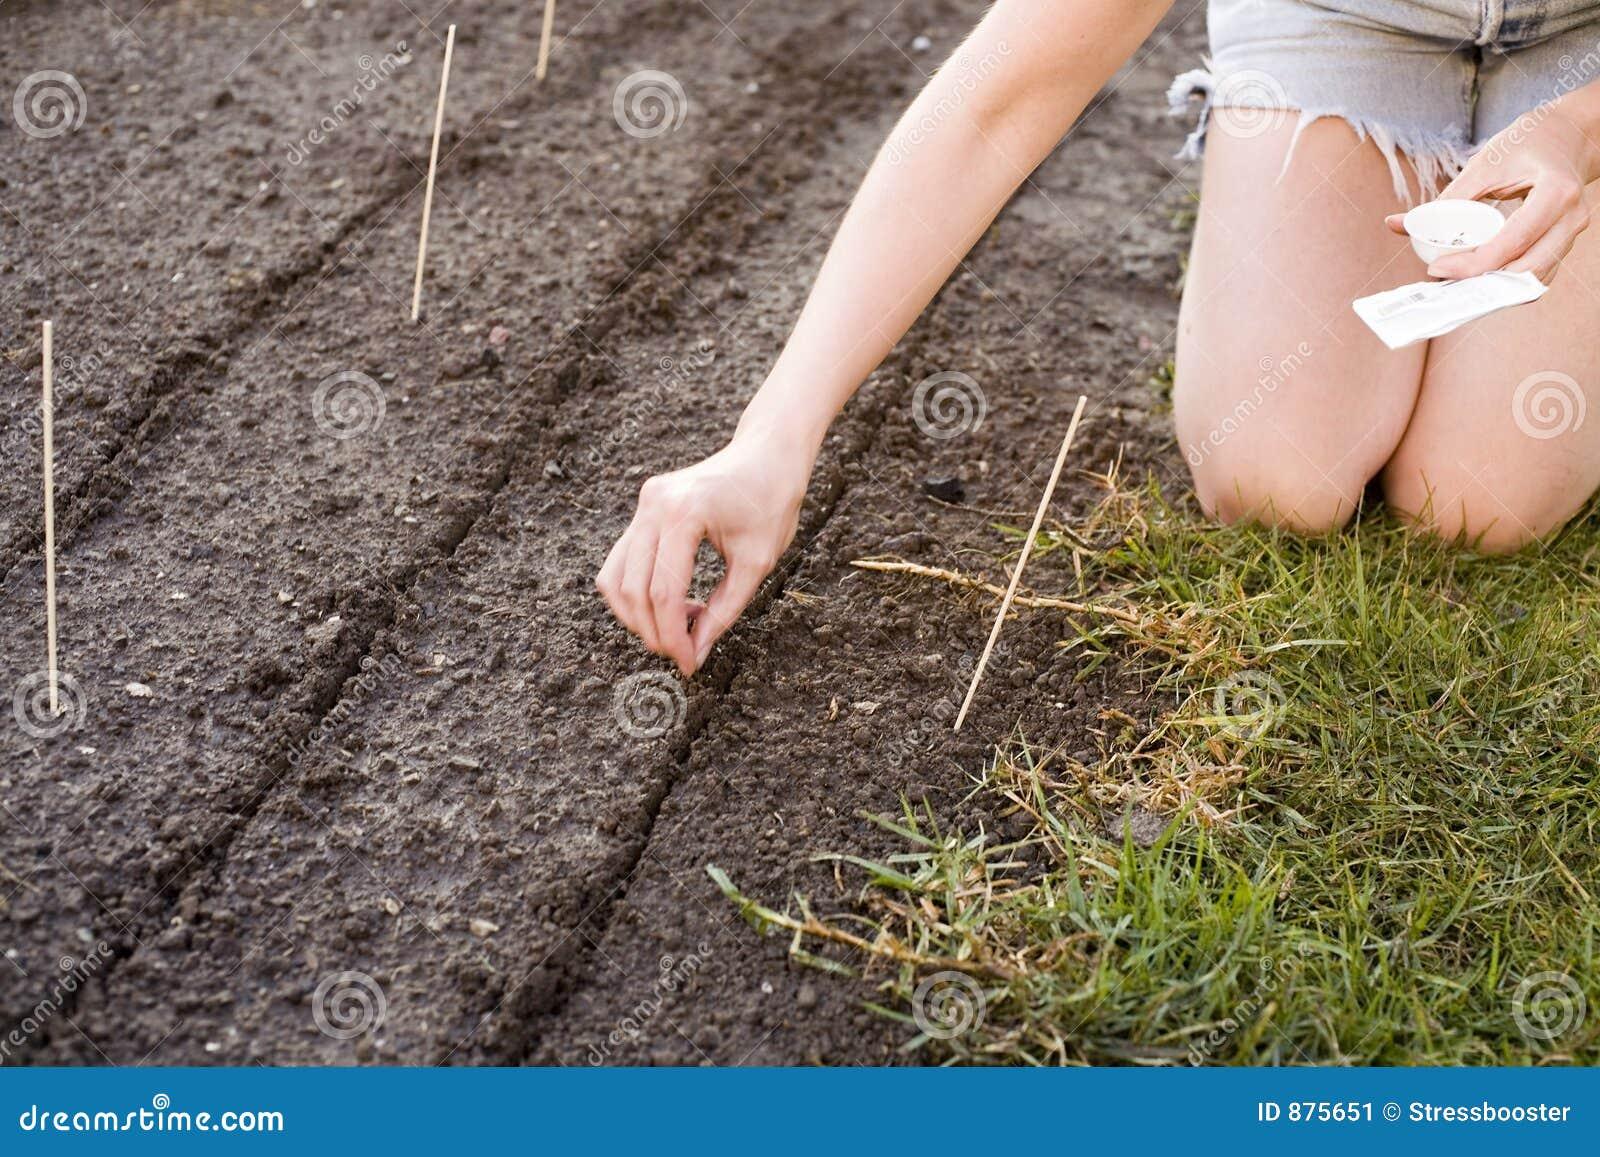 46 podwórków ogrodnictwo